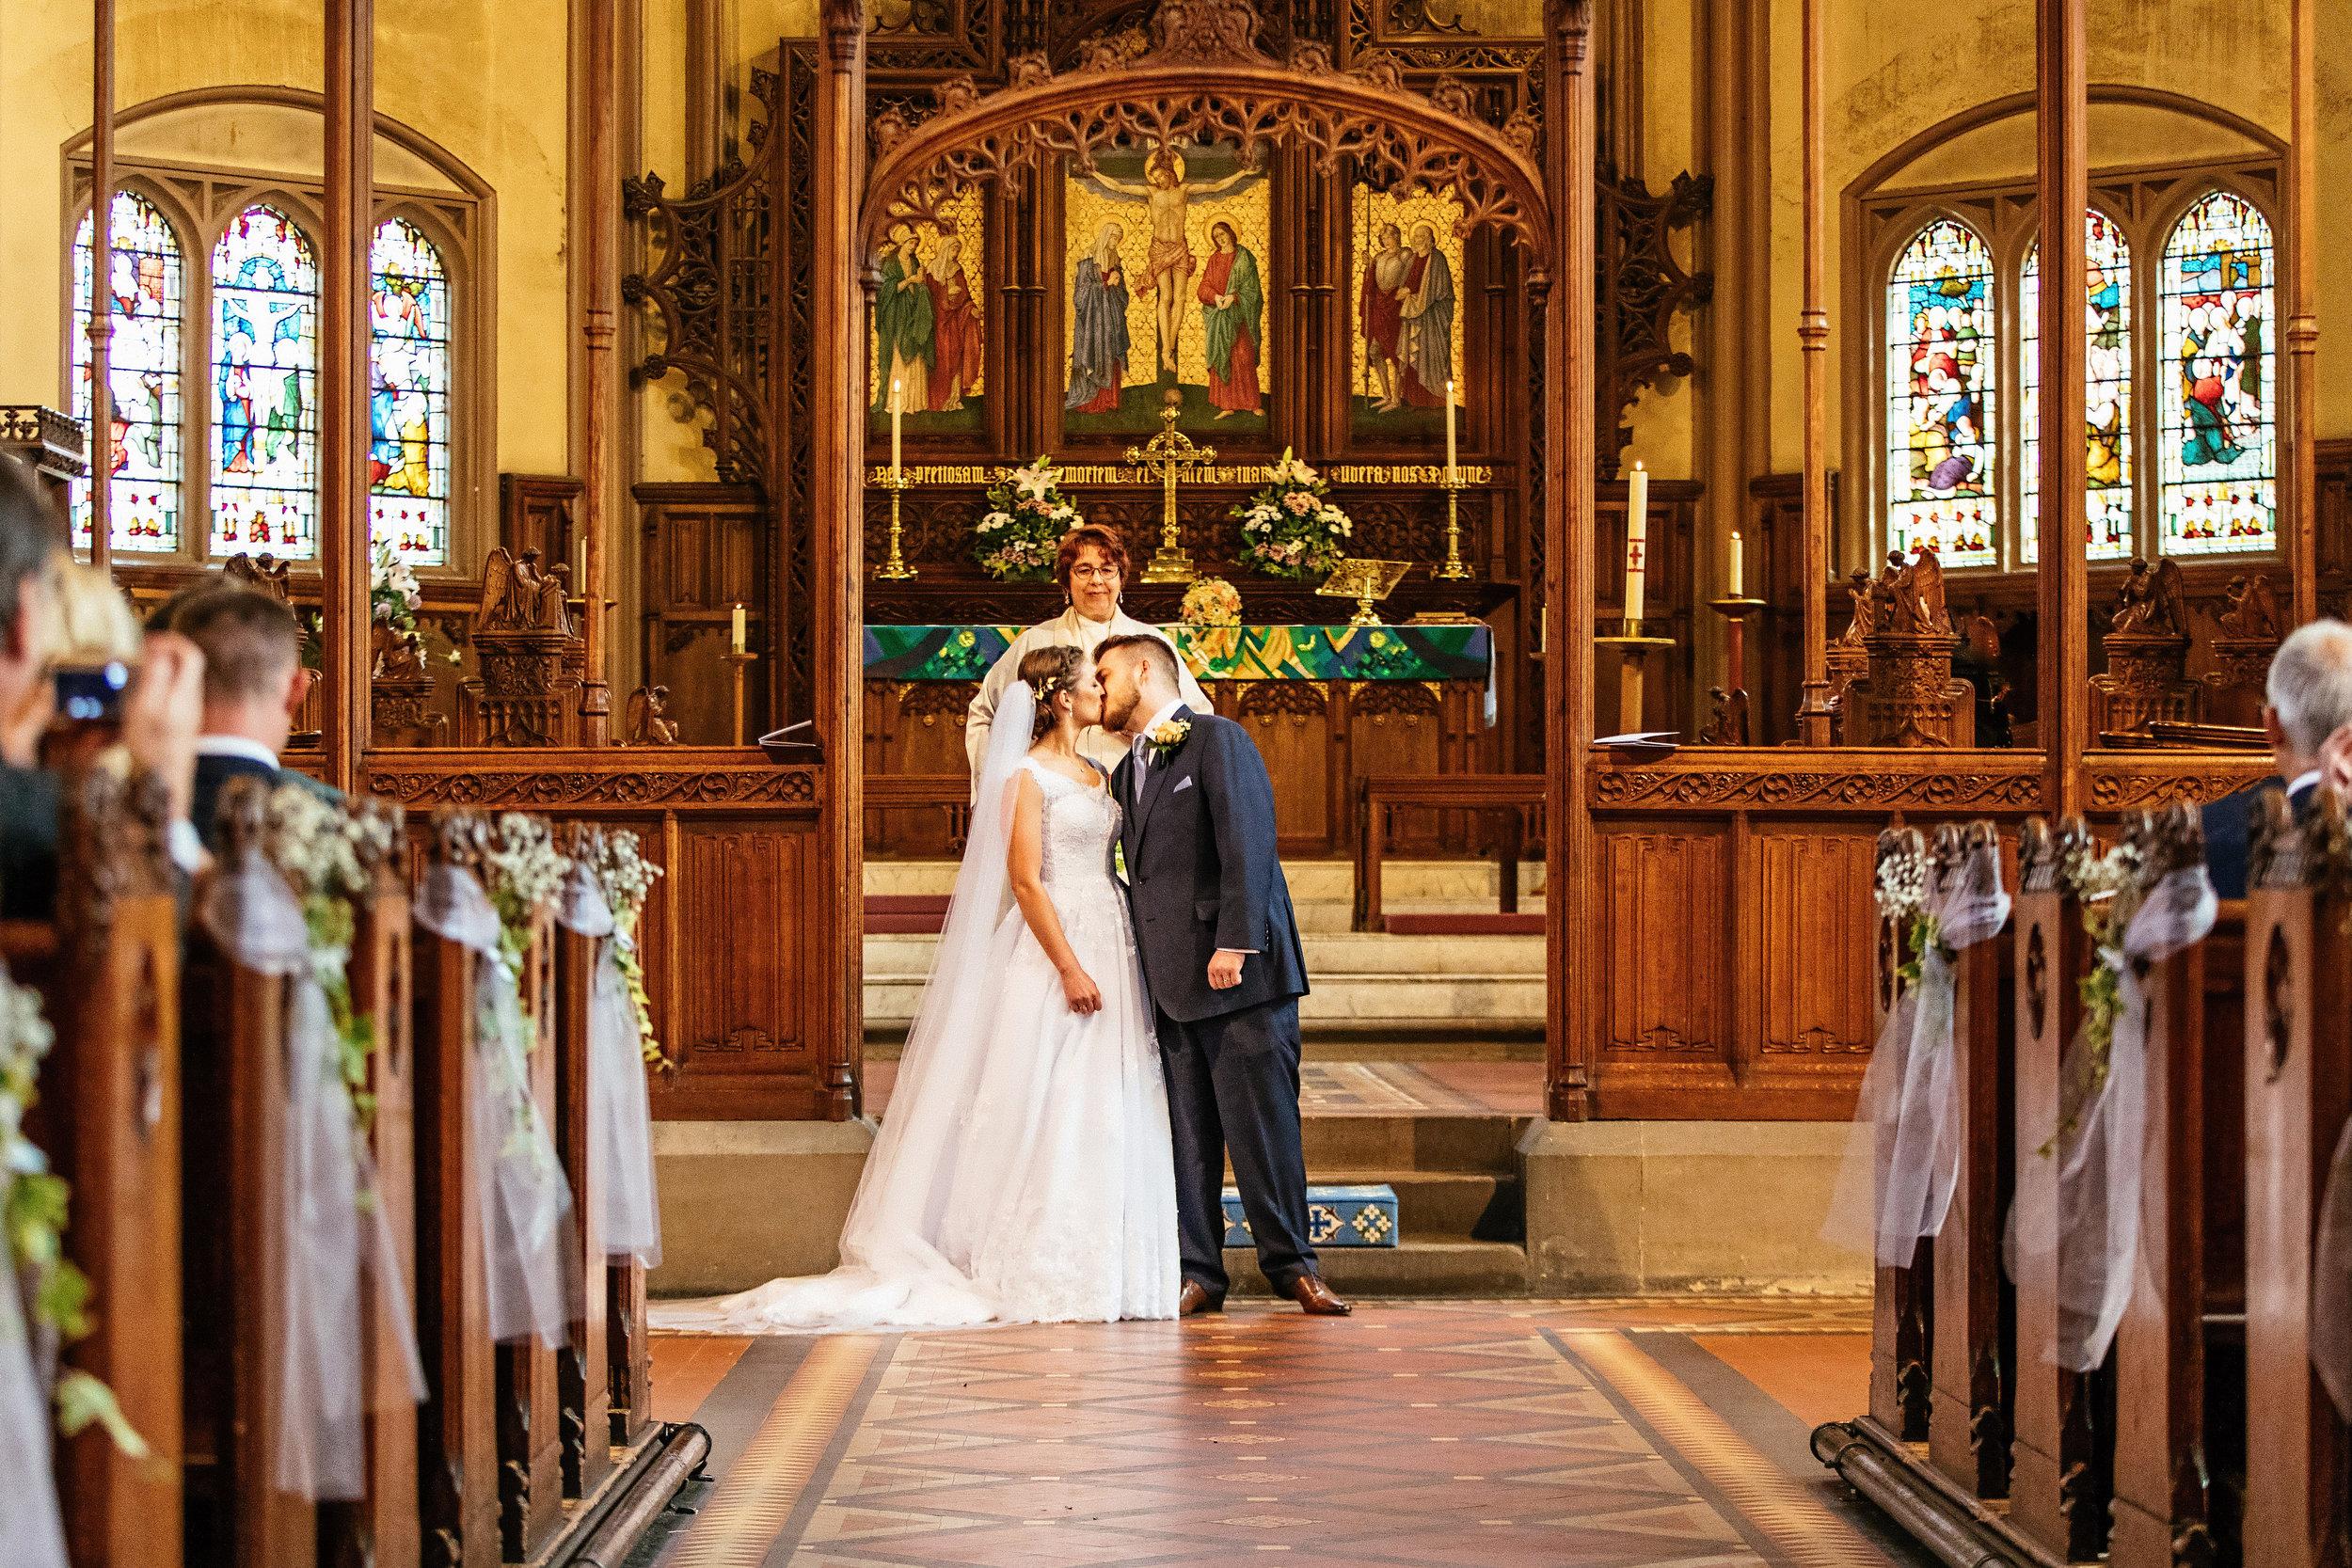 Kathryn-and-Mike-Wedding-Highlights-29.jpg